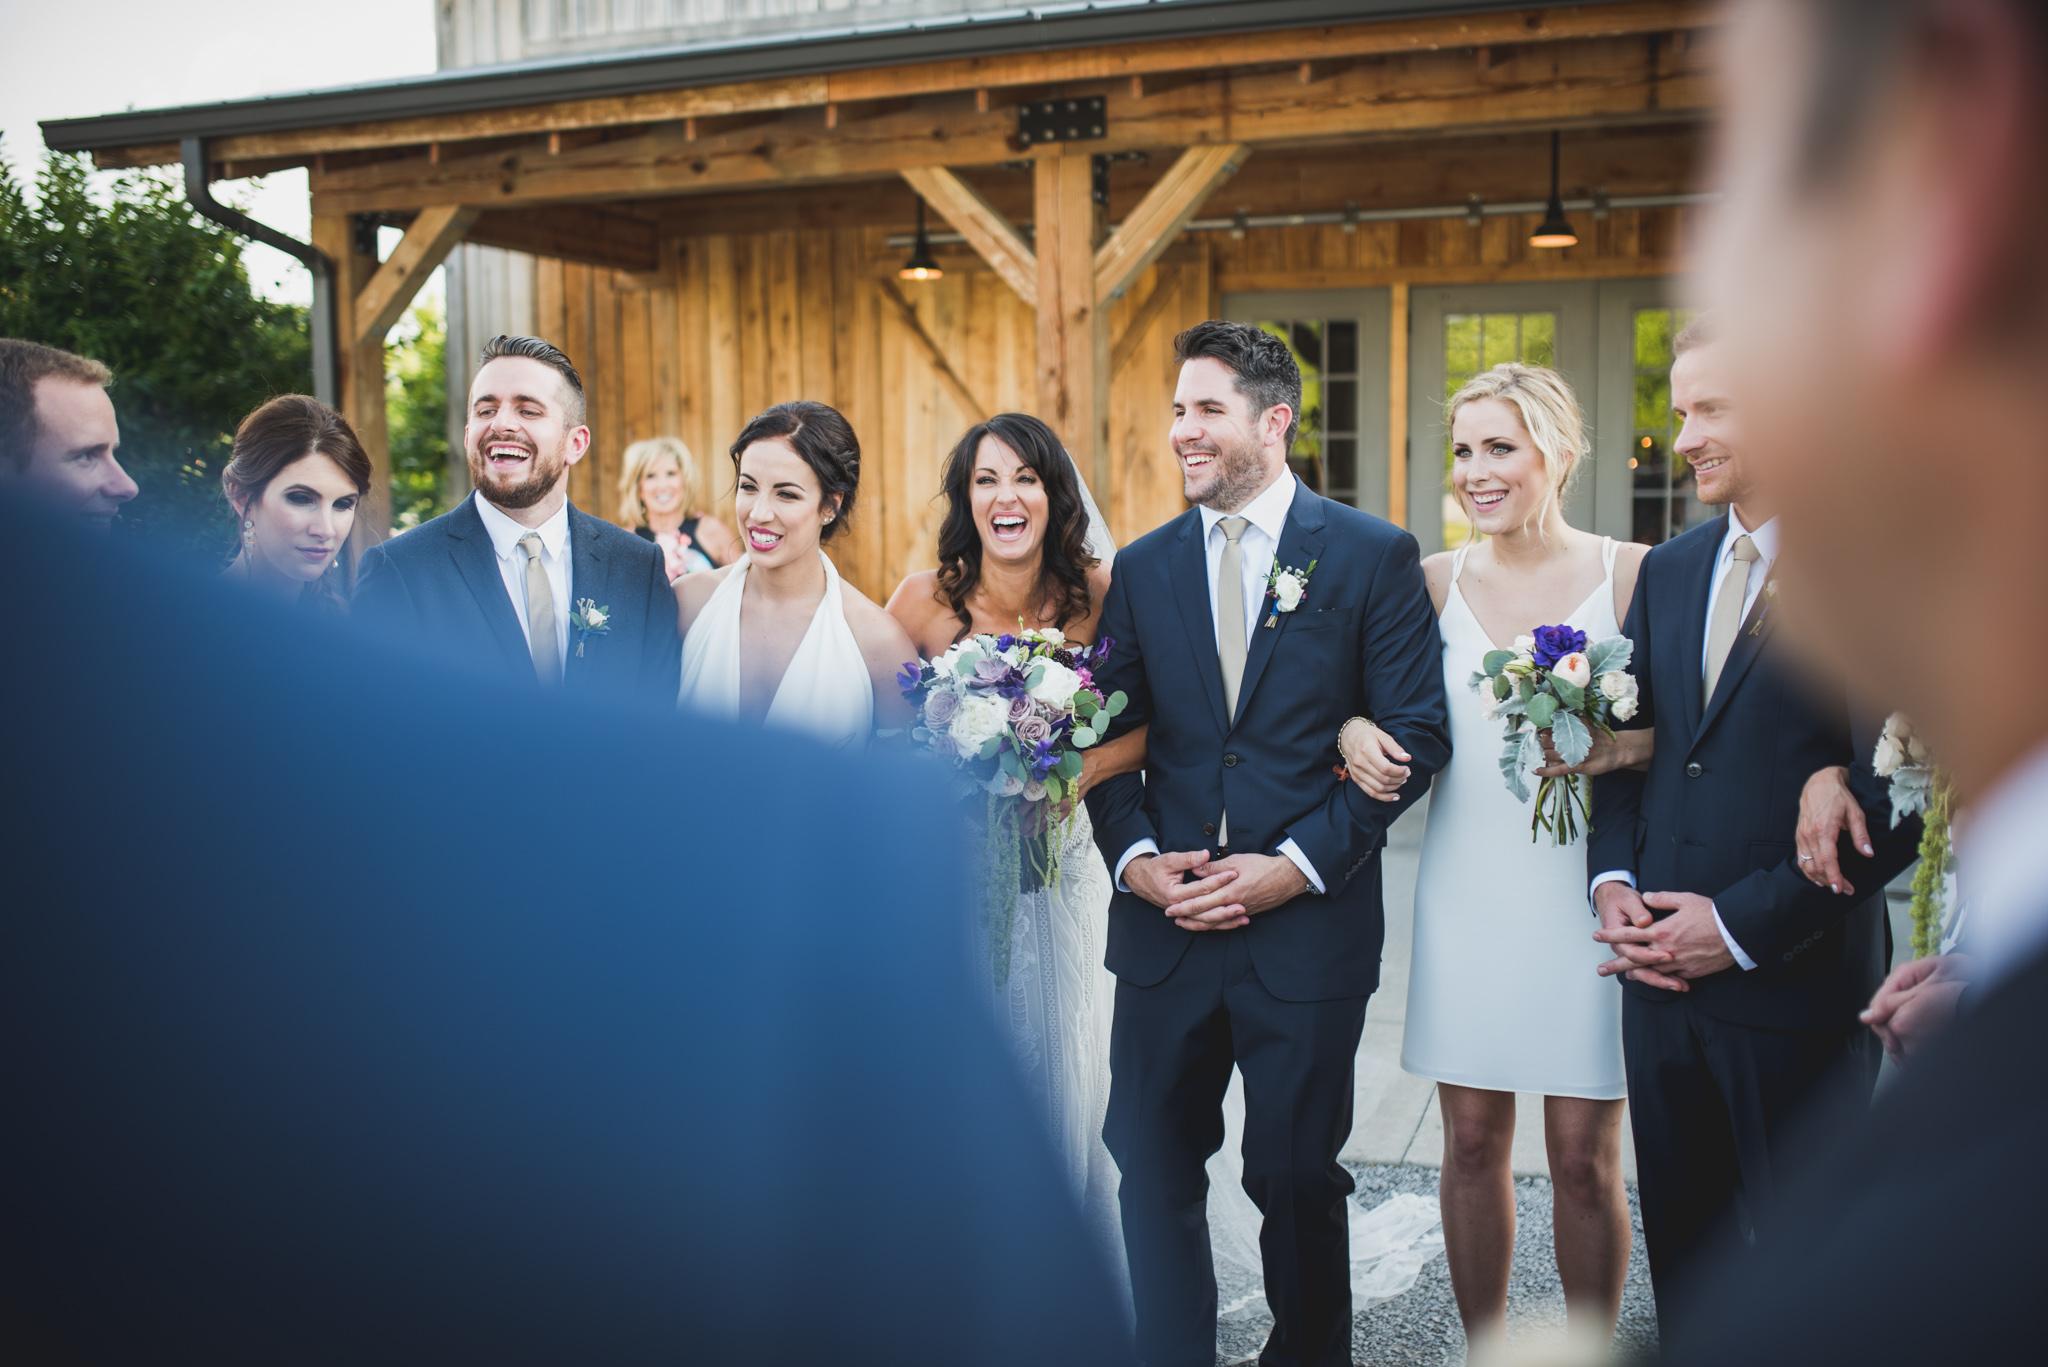 Mint Springs Farm Nashville TN Wedding Photographers55.jpg